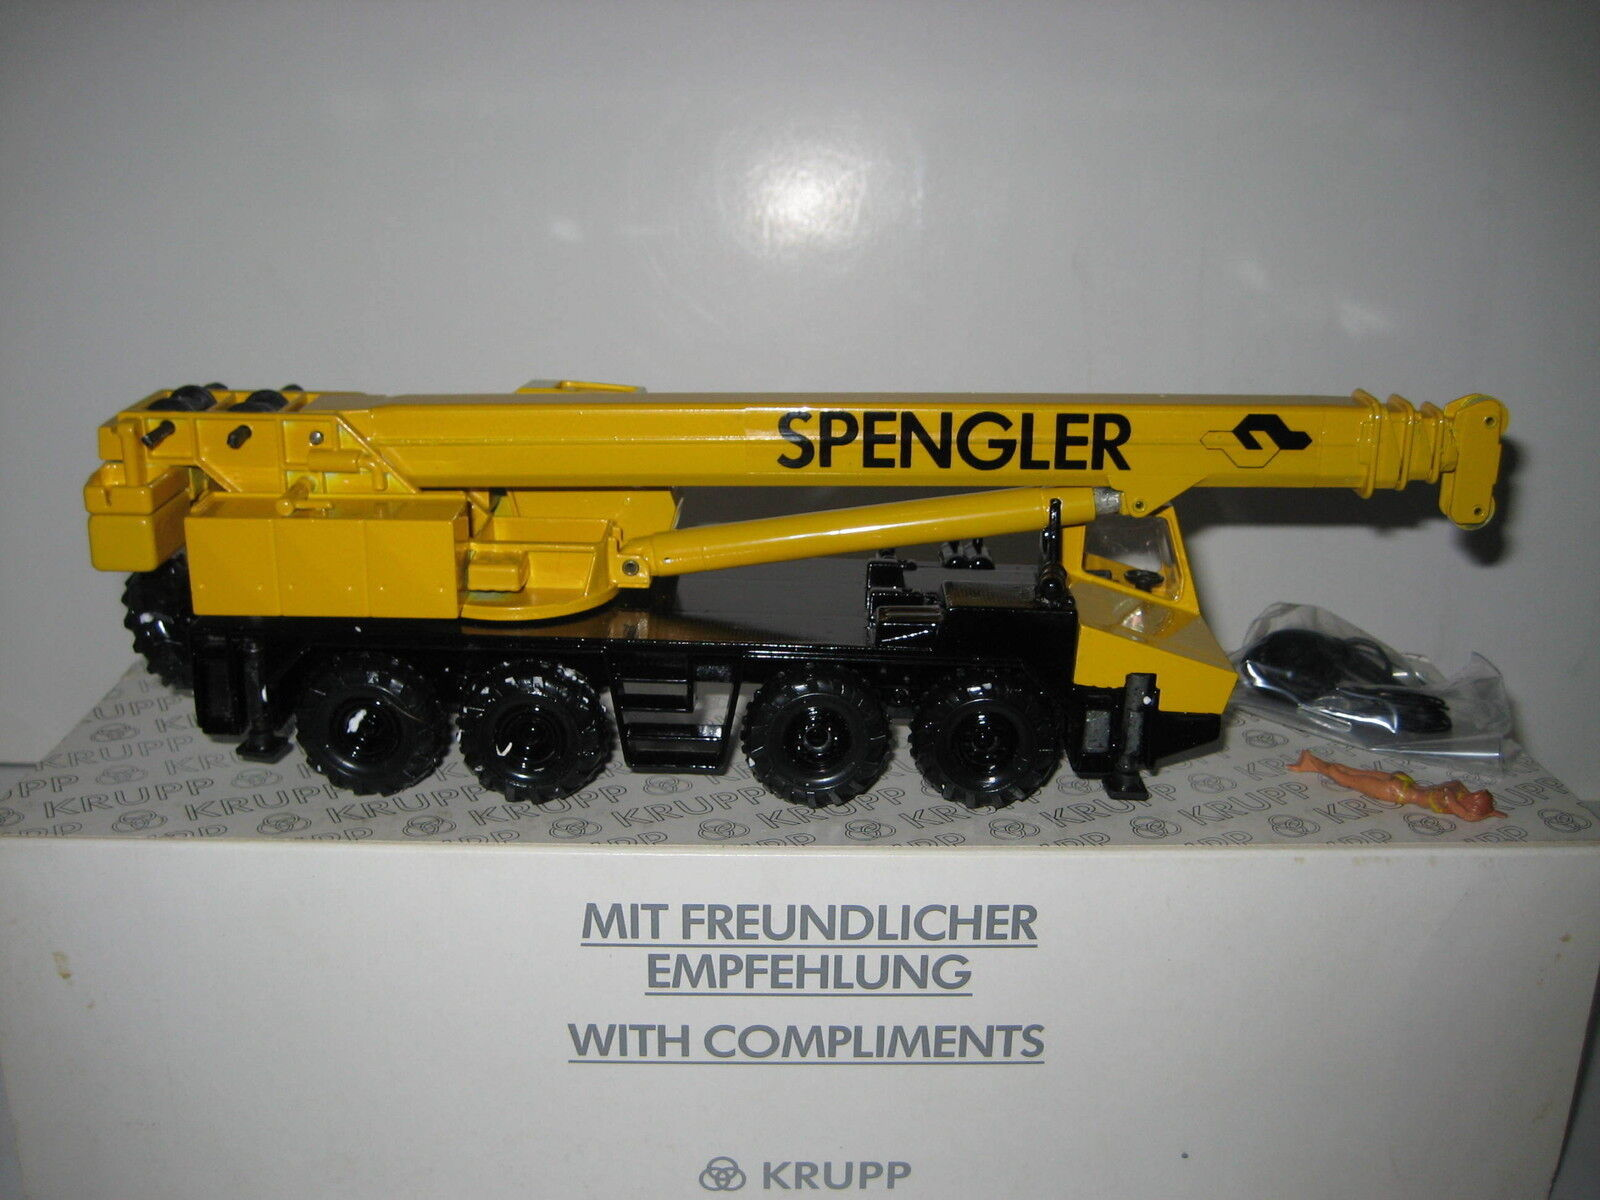 Krupp gmt 70 autokran spengler  2080.3 conrad 1 50 original packaging